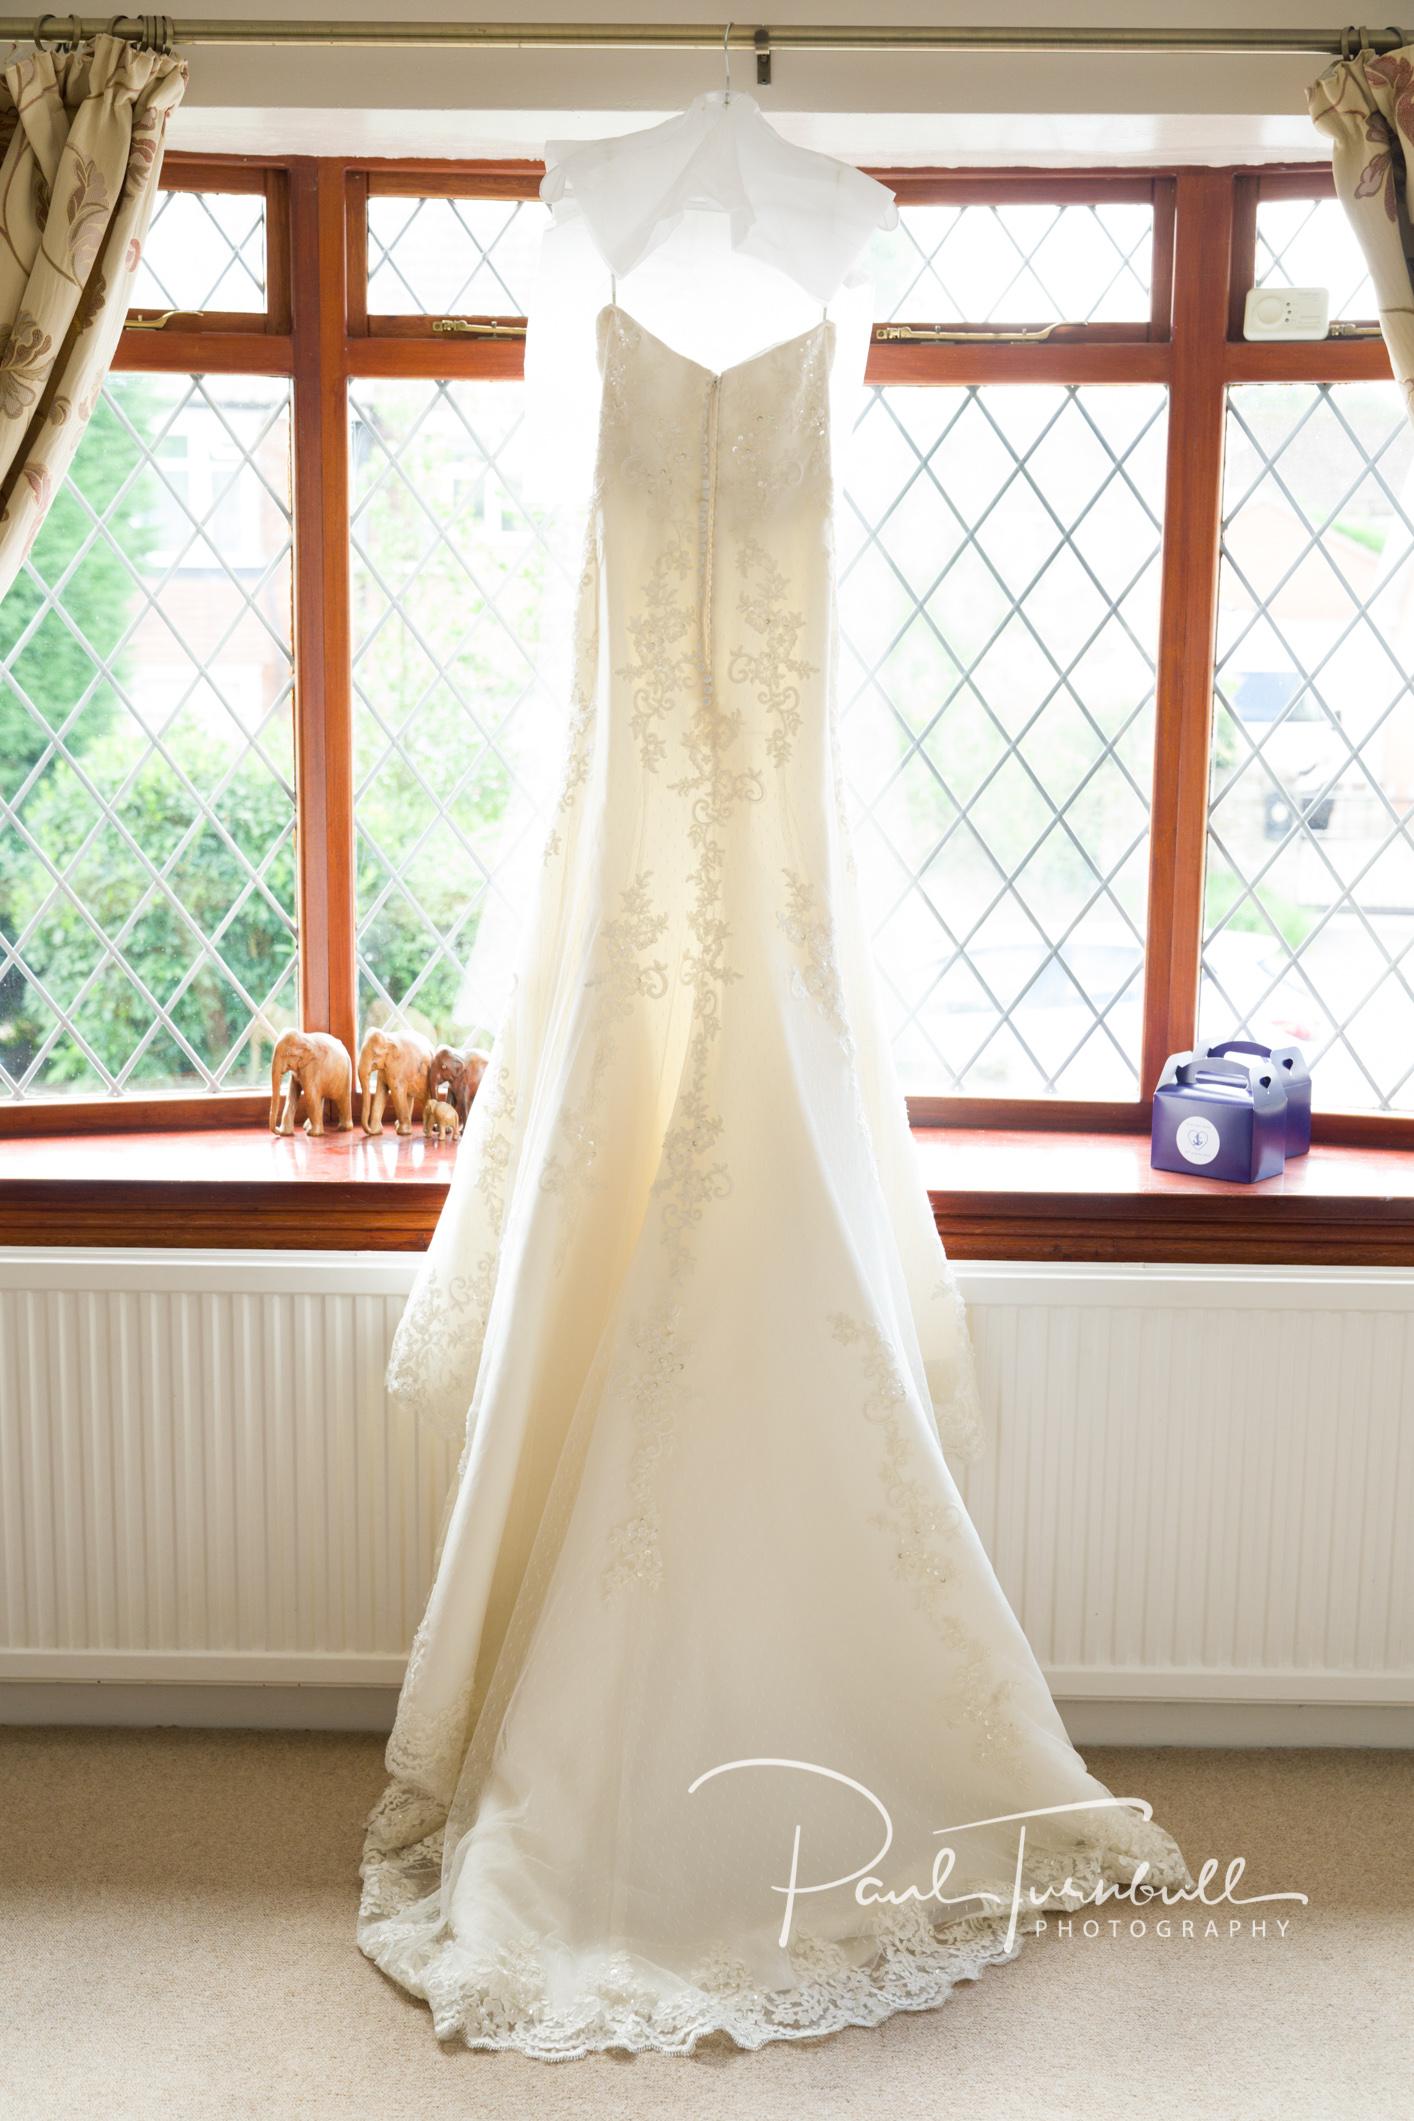 wedding-photographer-south-dalton-walkington-yorkshire-emma-james-010.jpg